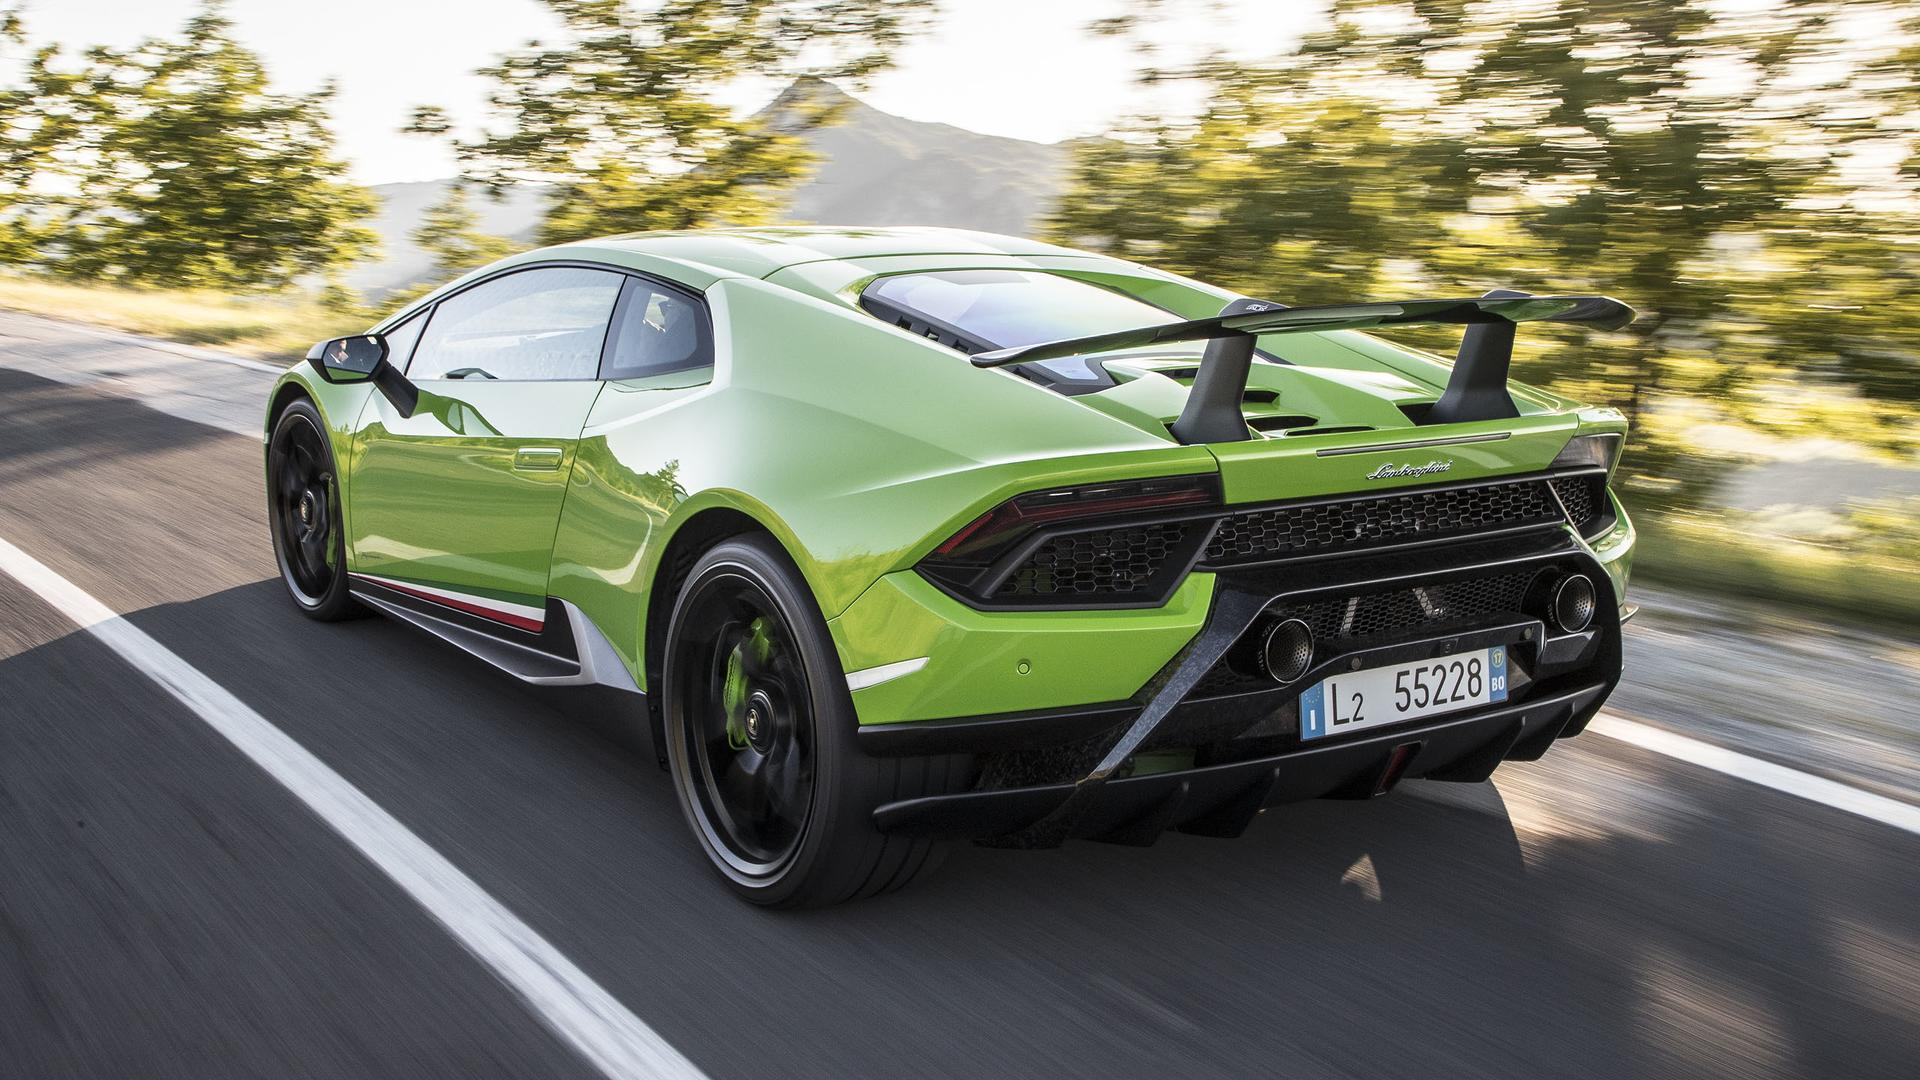 2017-lamborghini-huracan-performante-first-drive Extraordinary Lamborghini Huracan Need for Speed Cars Trend